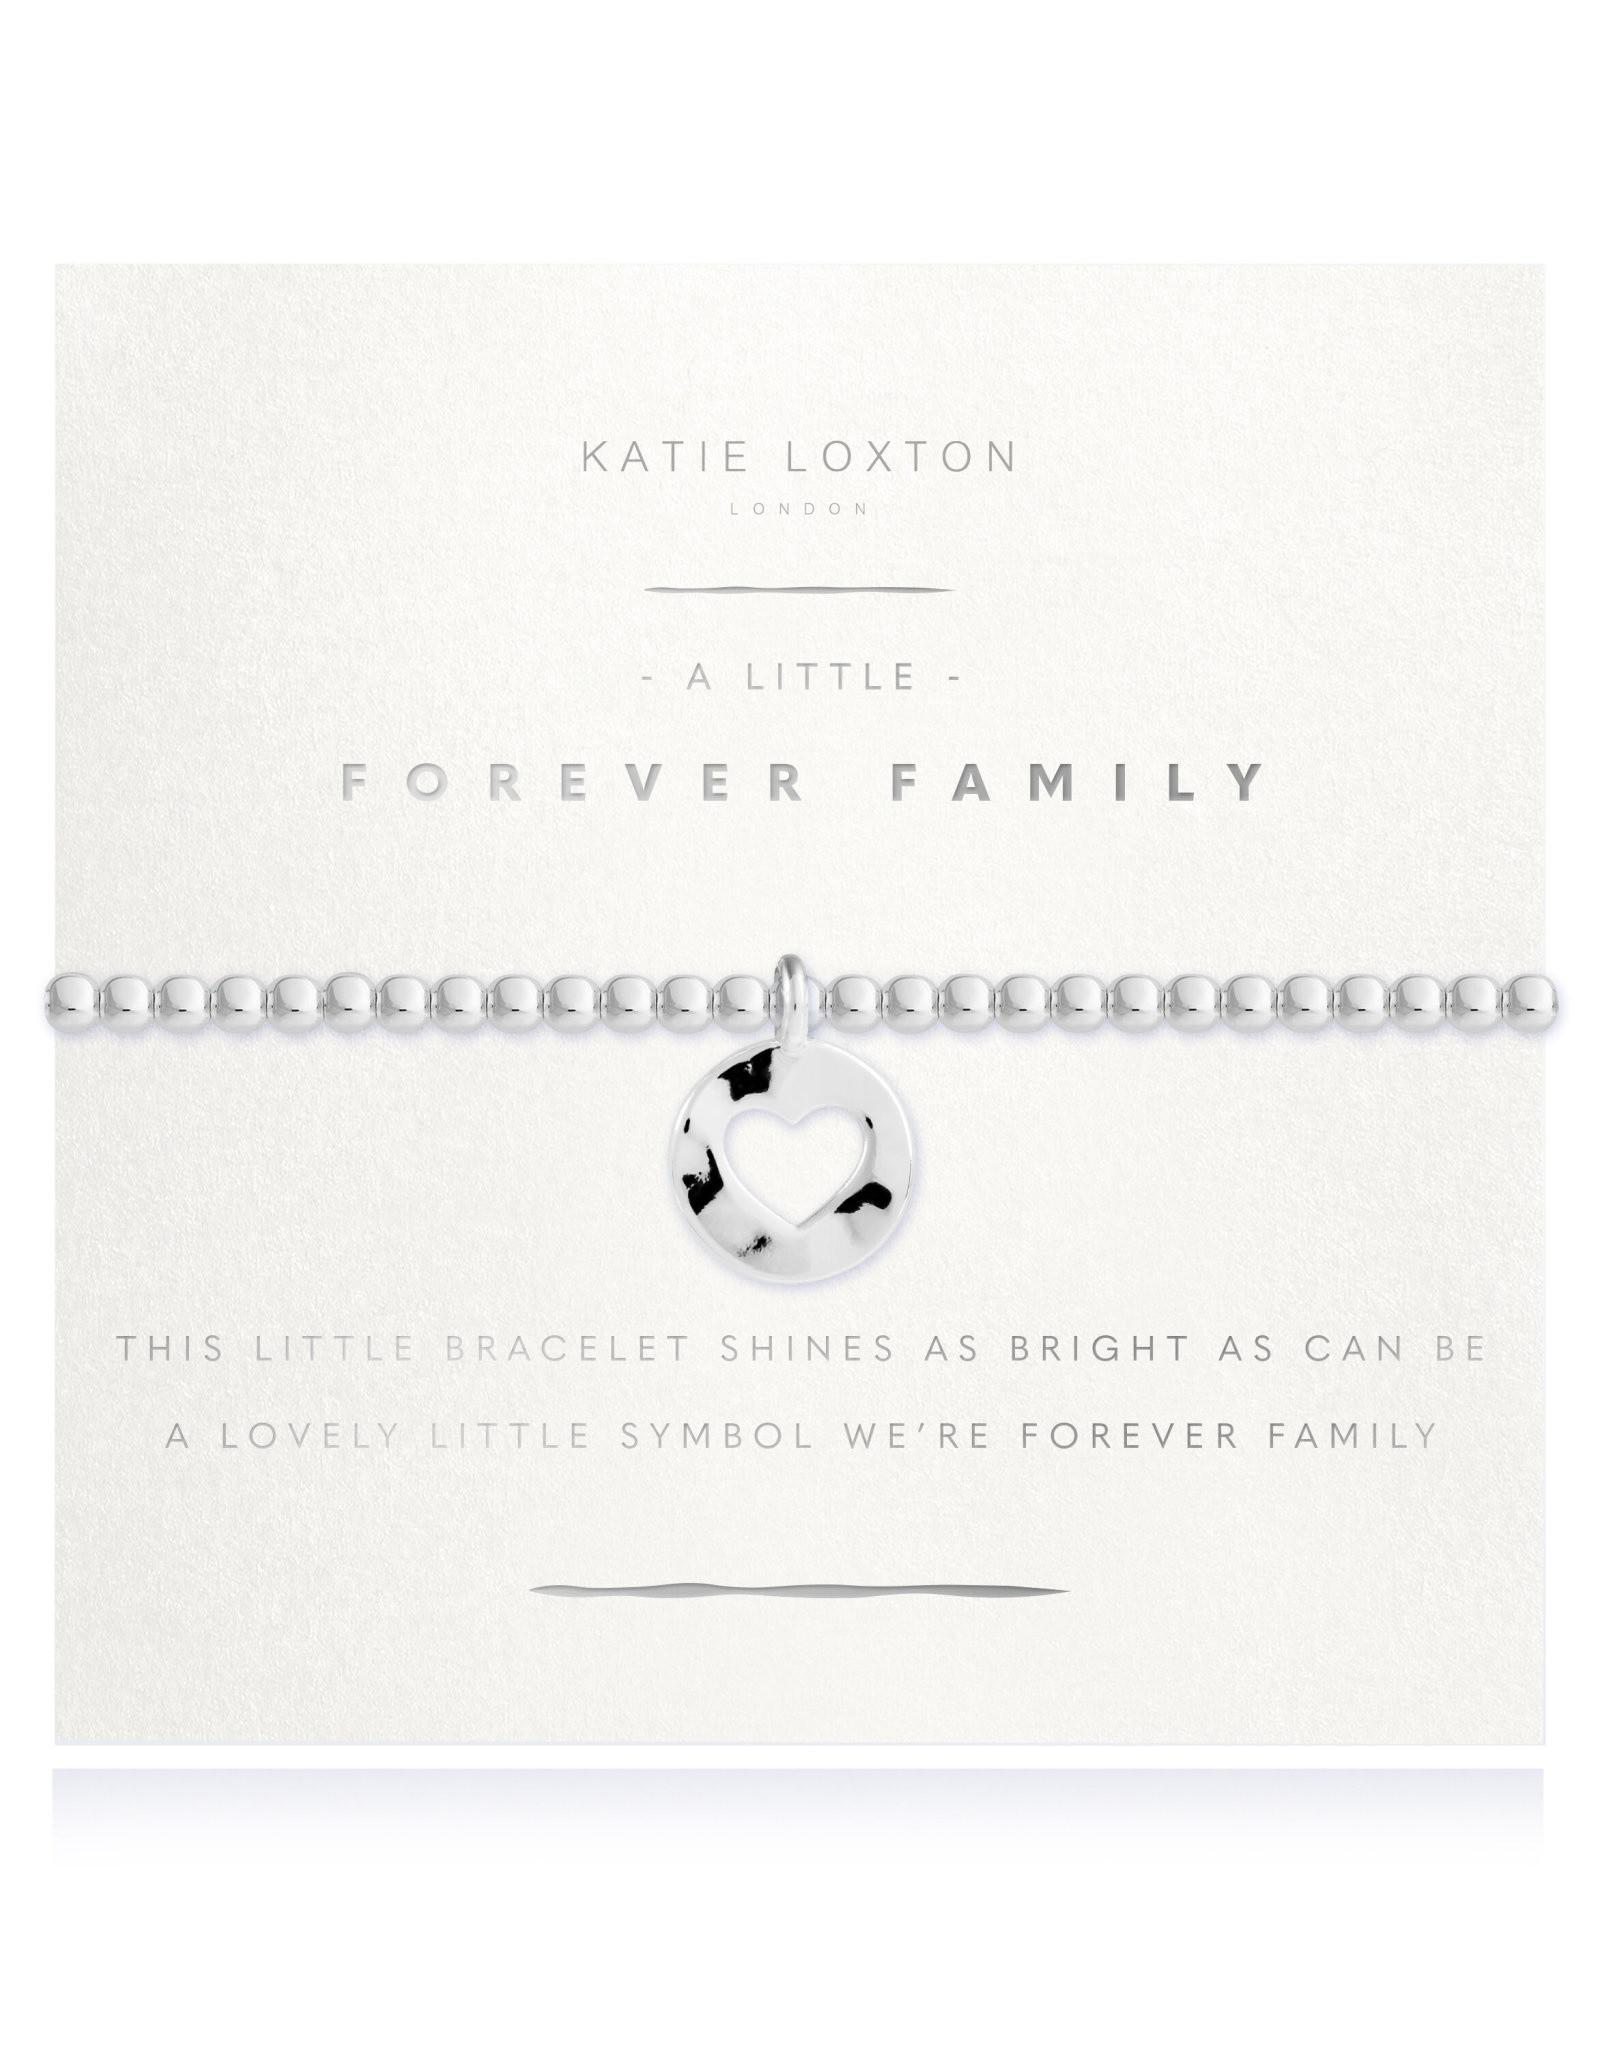 Katie Loxton A Little Forever Family Bracelet